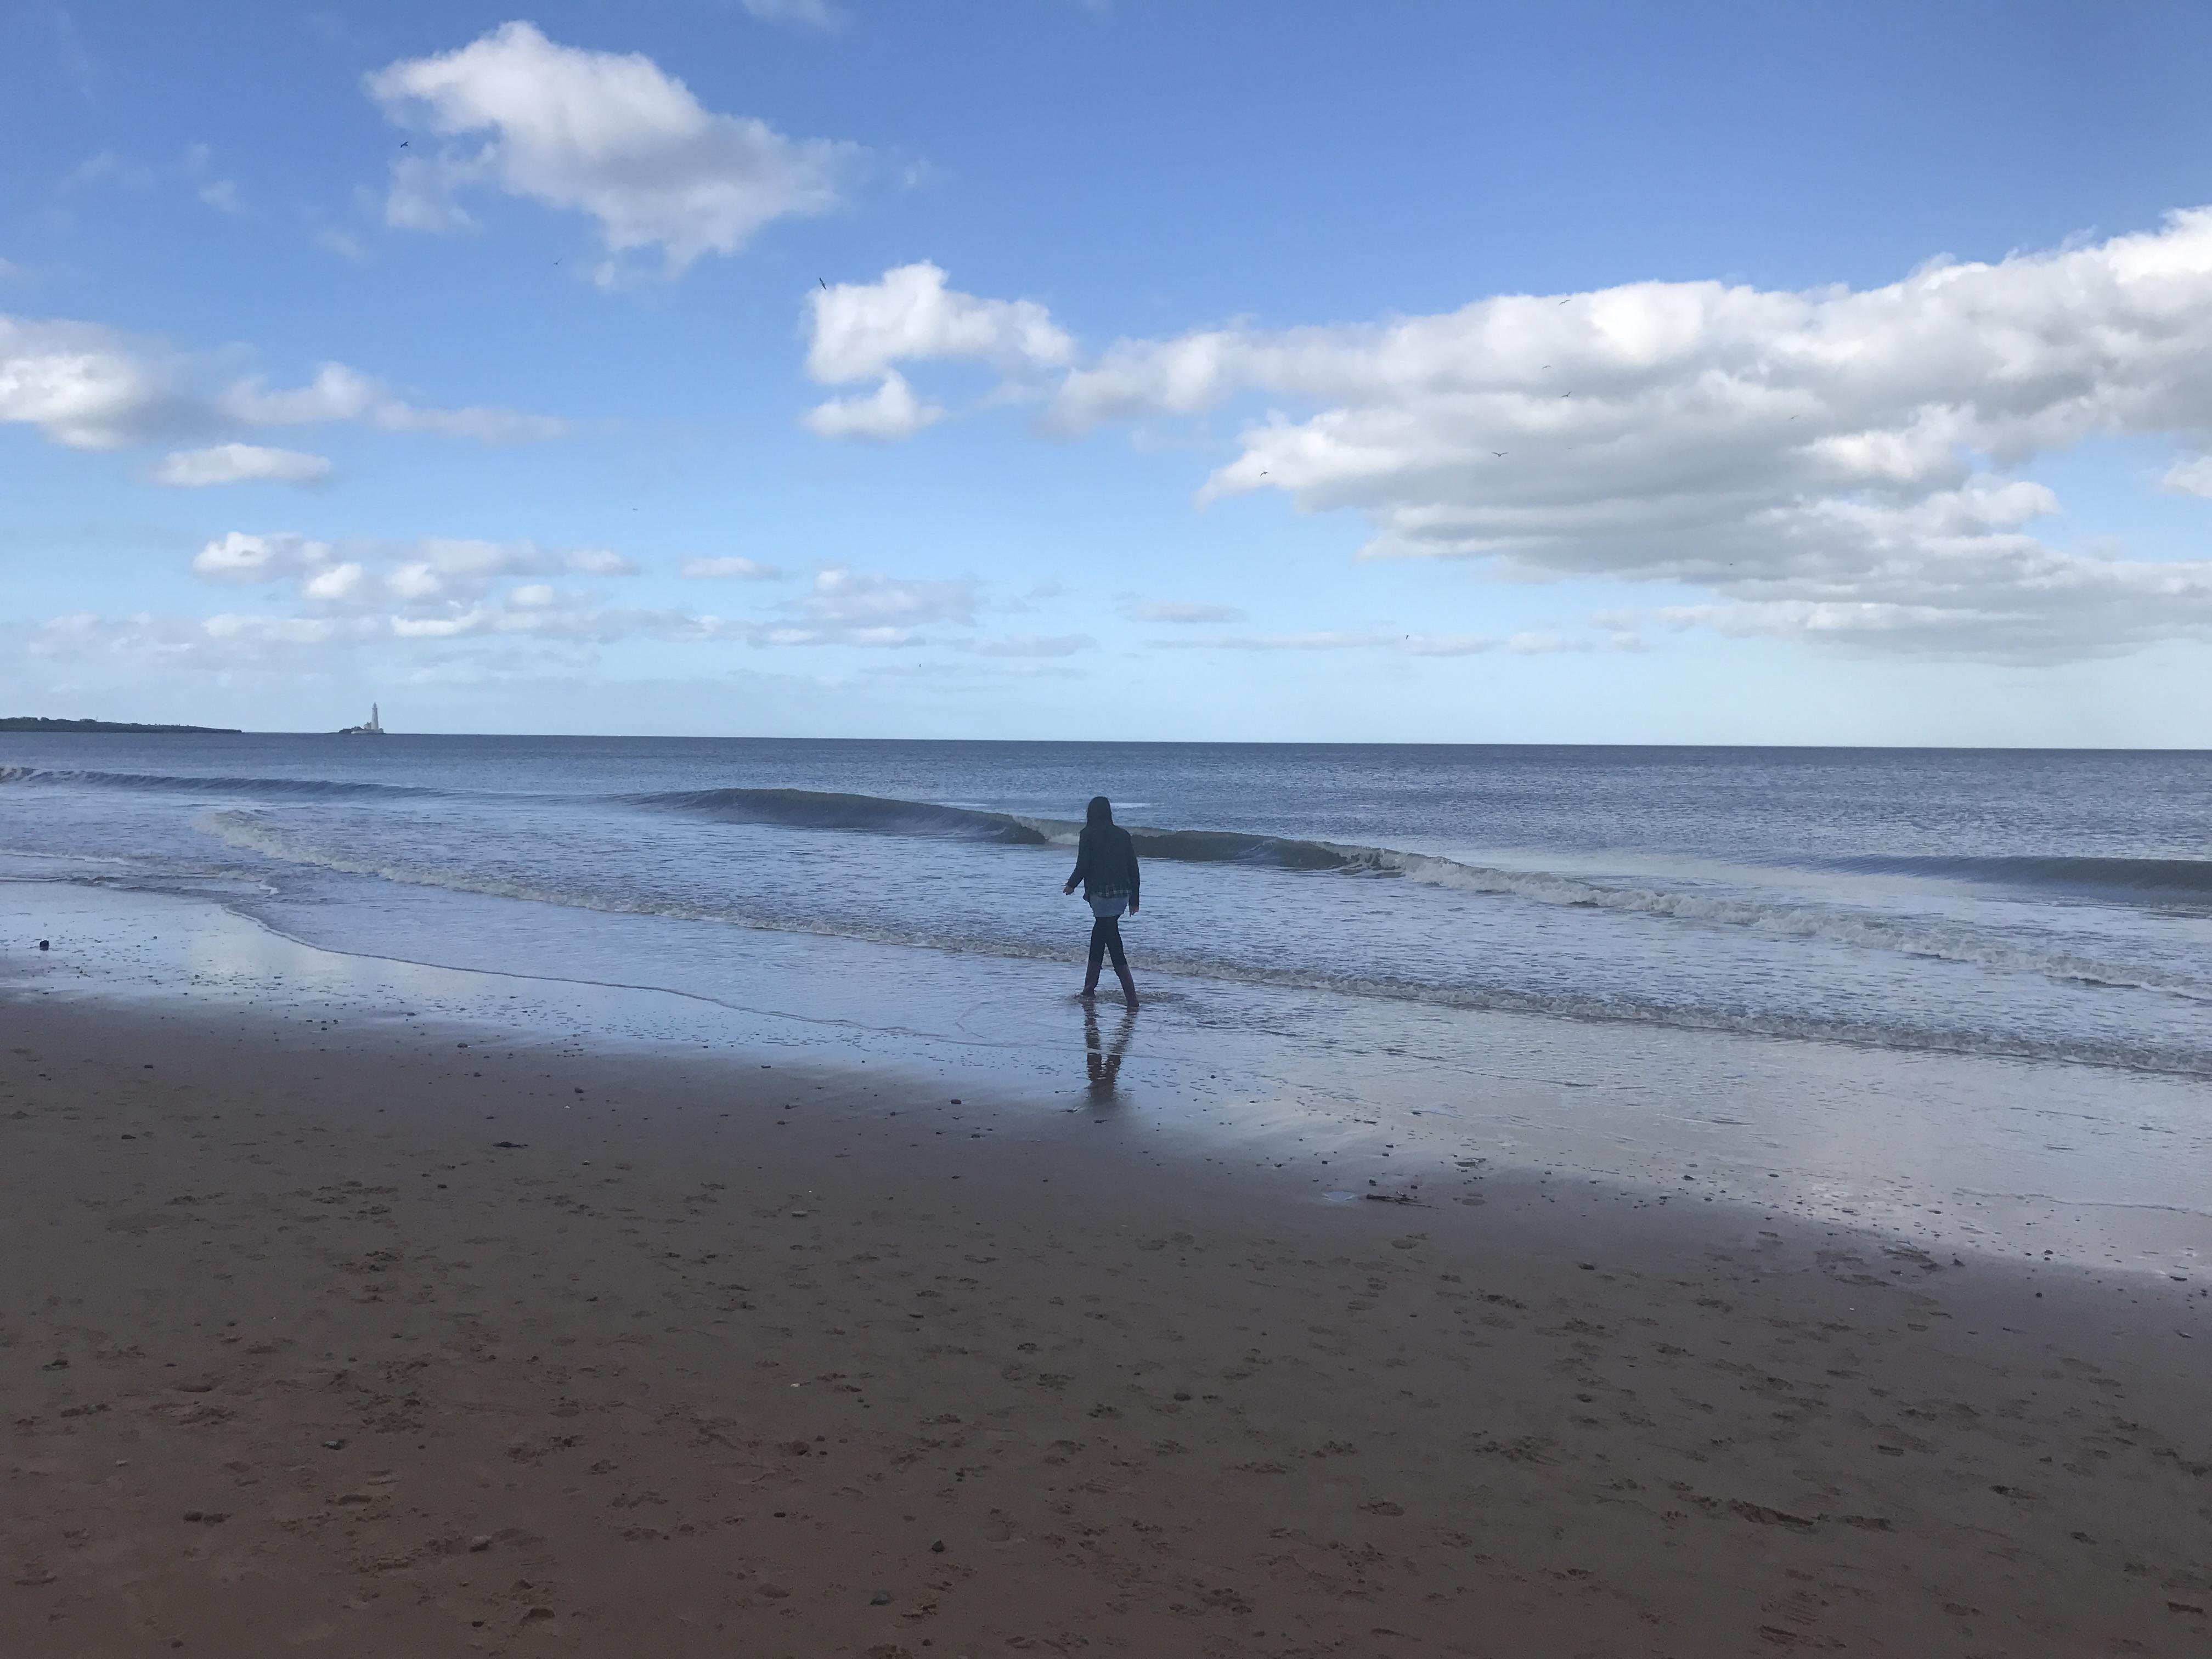 Walking down Whitley Bay beach